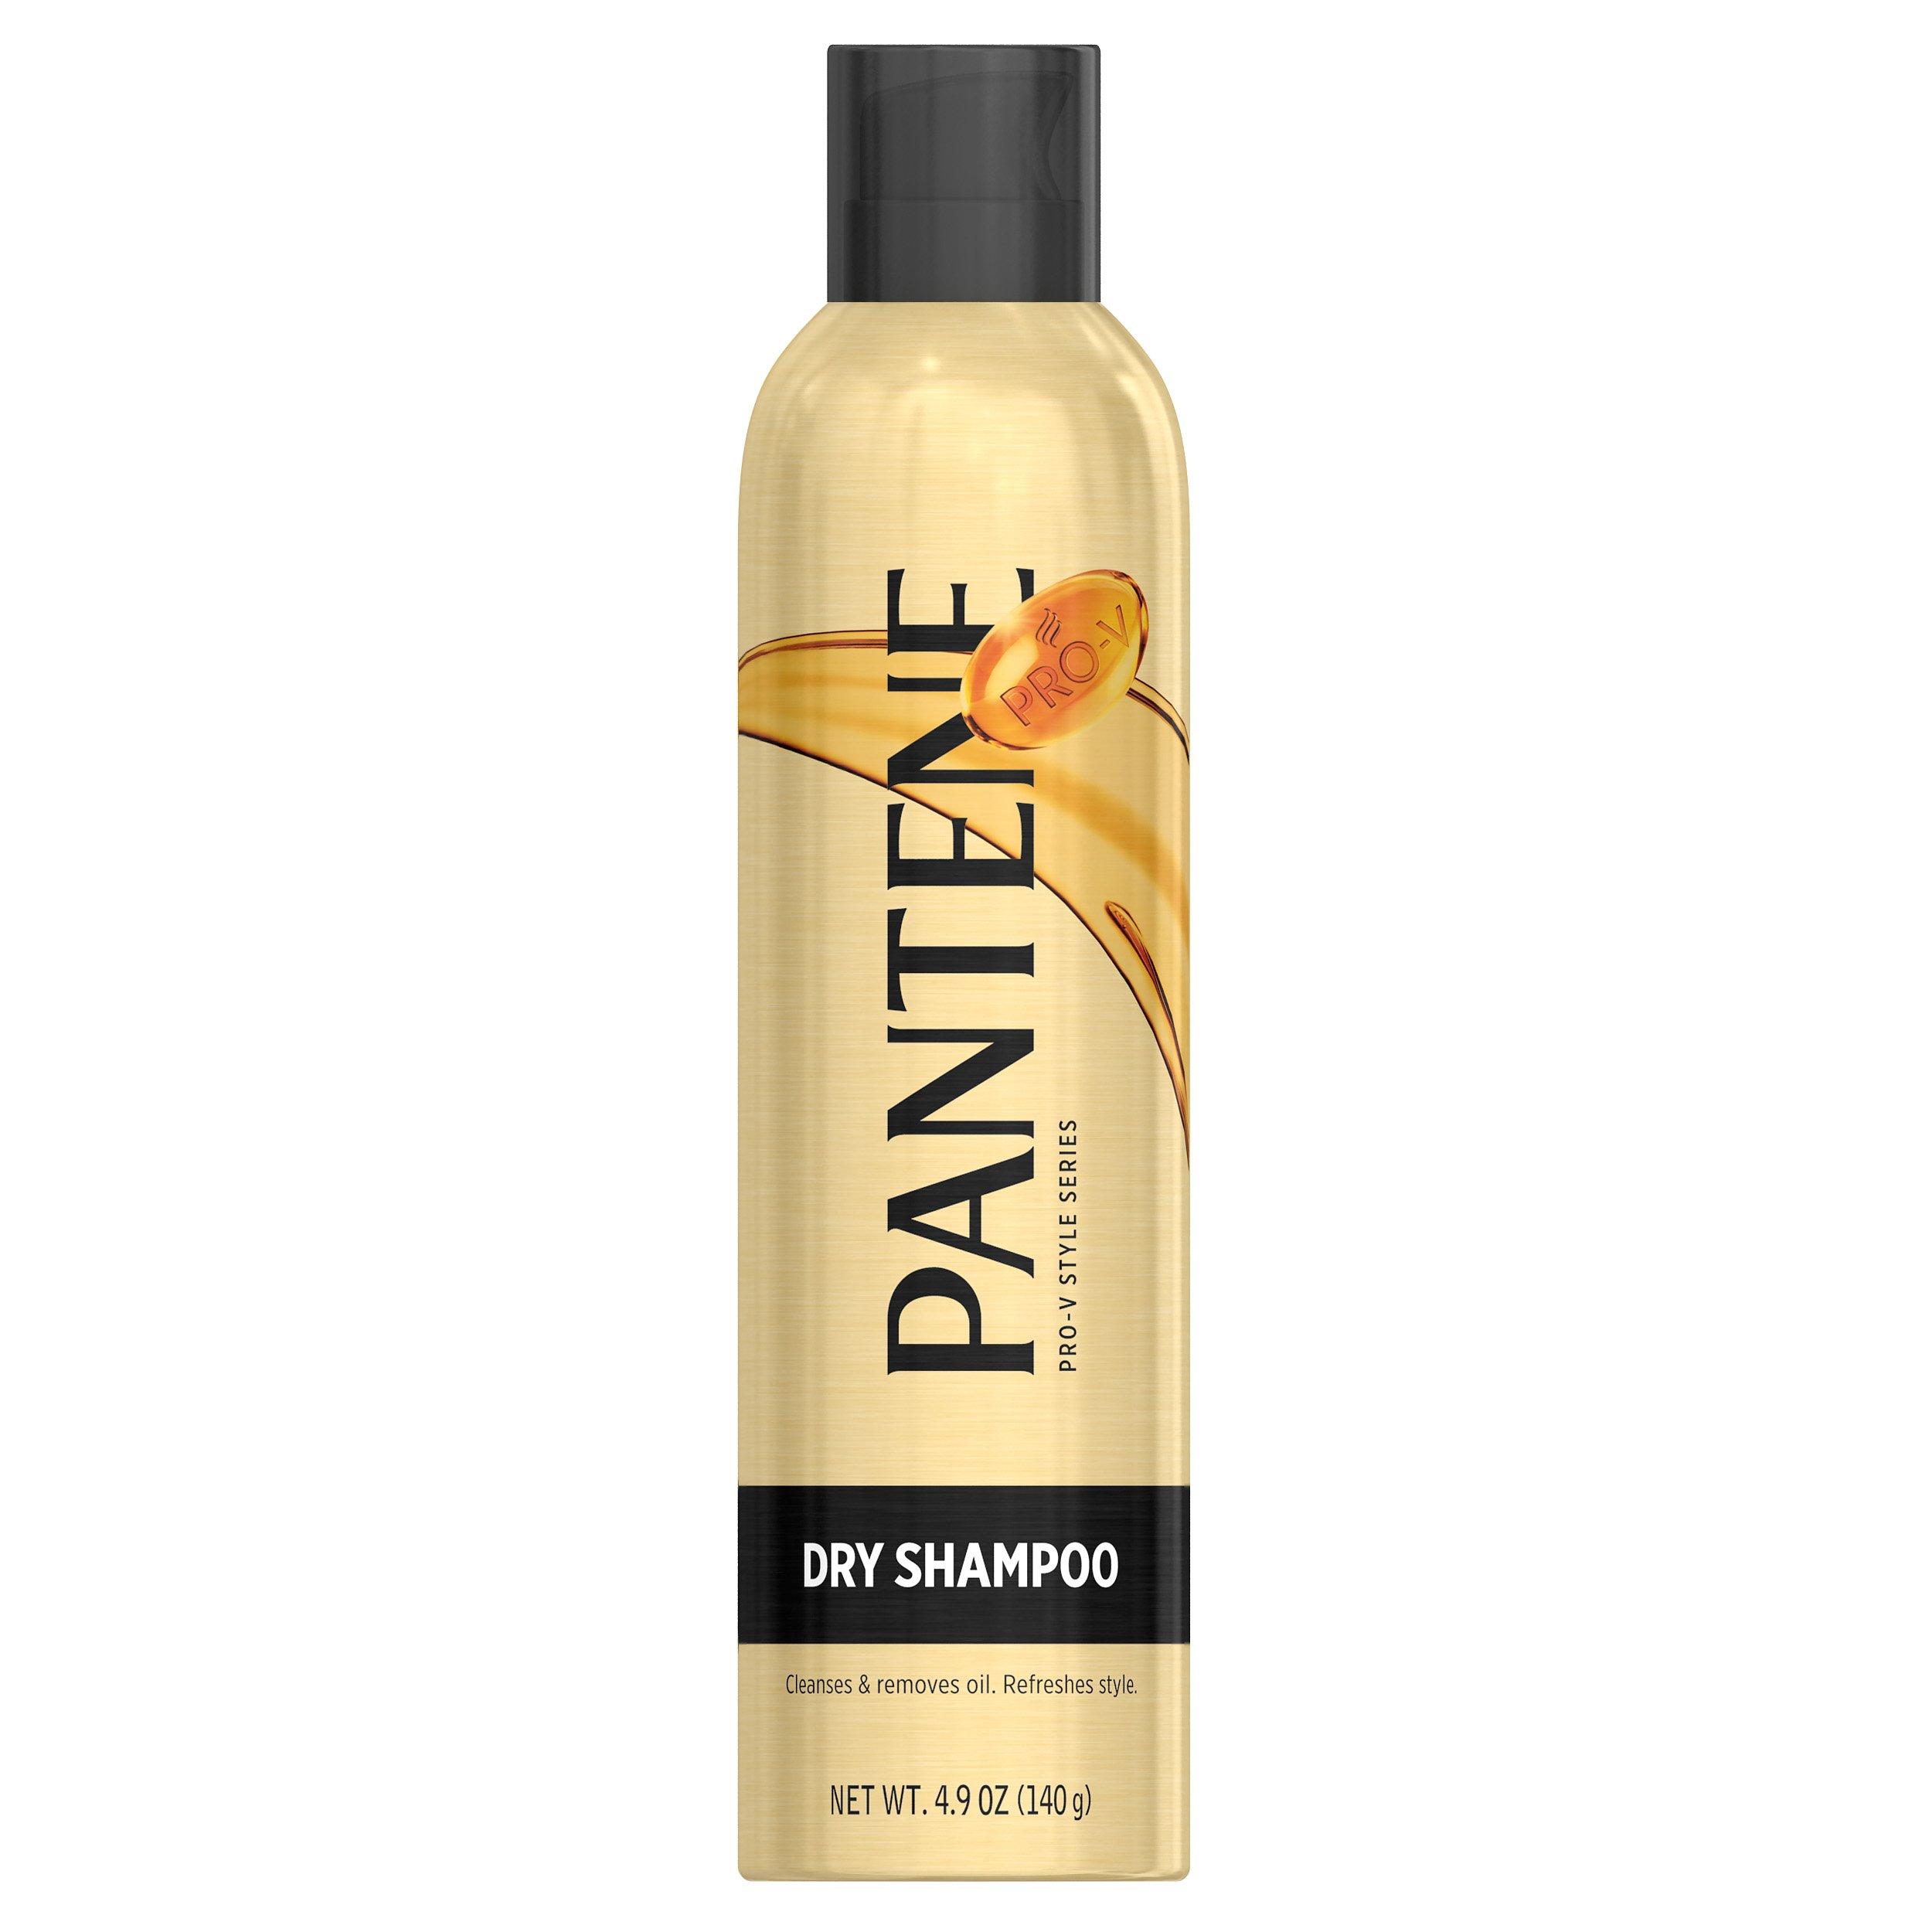 Pantene Pro V Dry Clean And Fresh Shampoo Shop Shampoo Conditioner At H E B